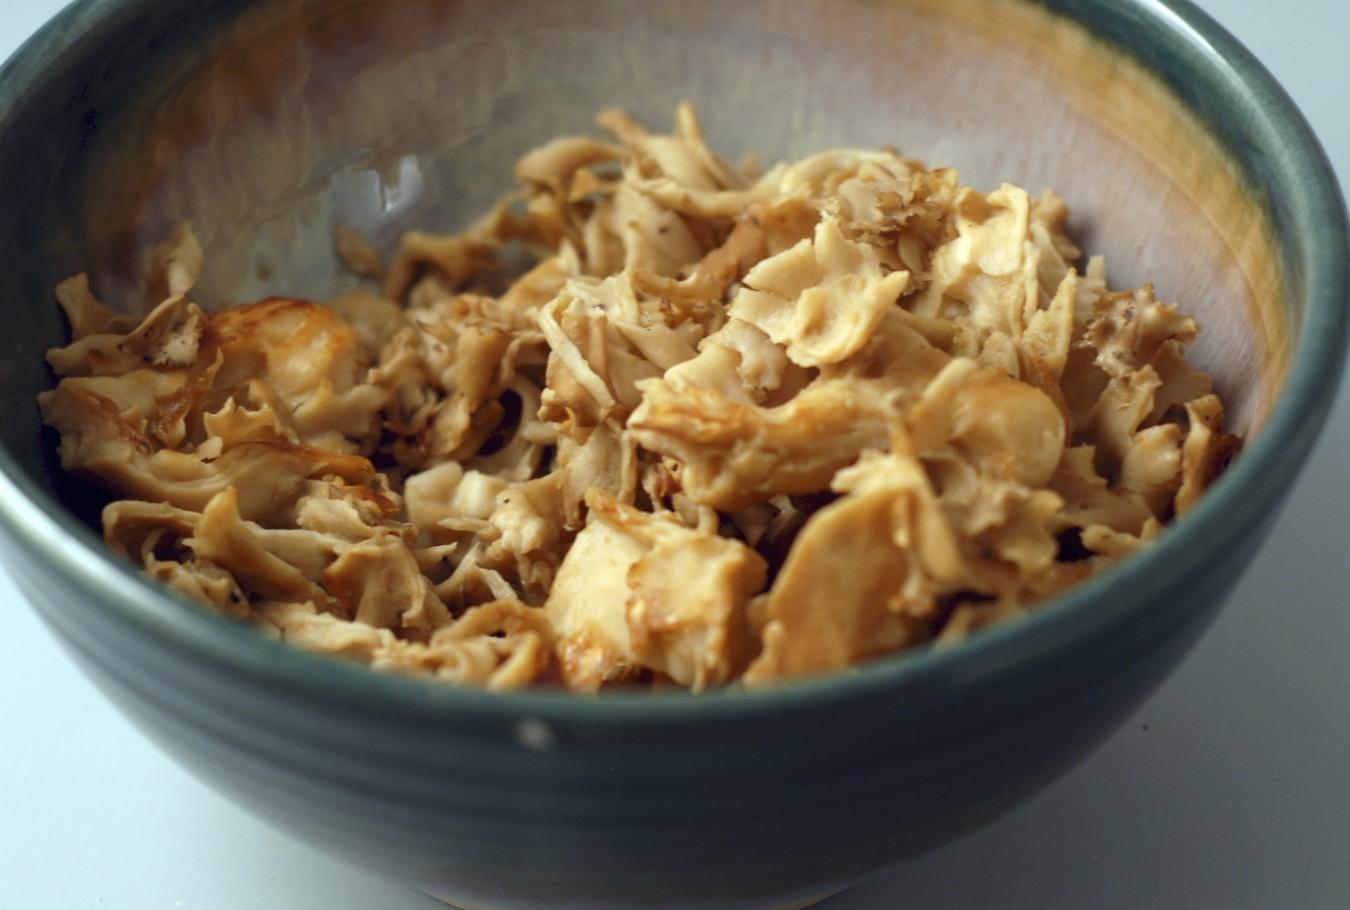 cauliflower mushroom (Sparassis crispa)